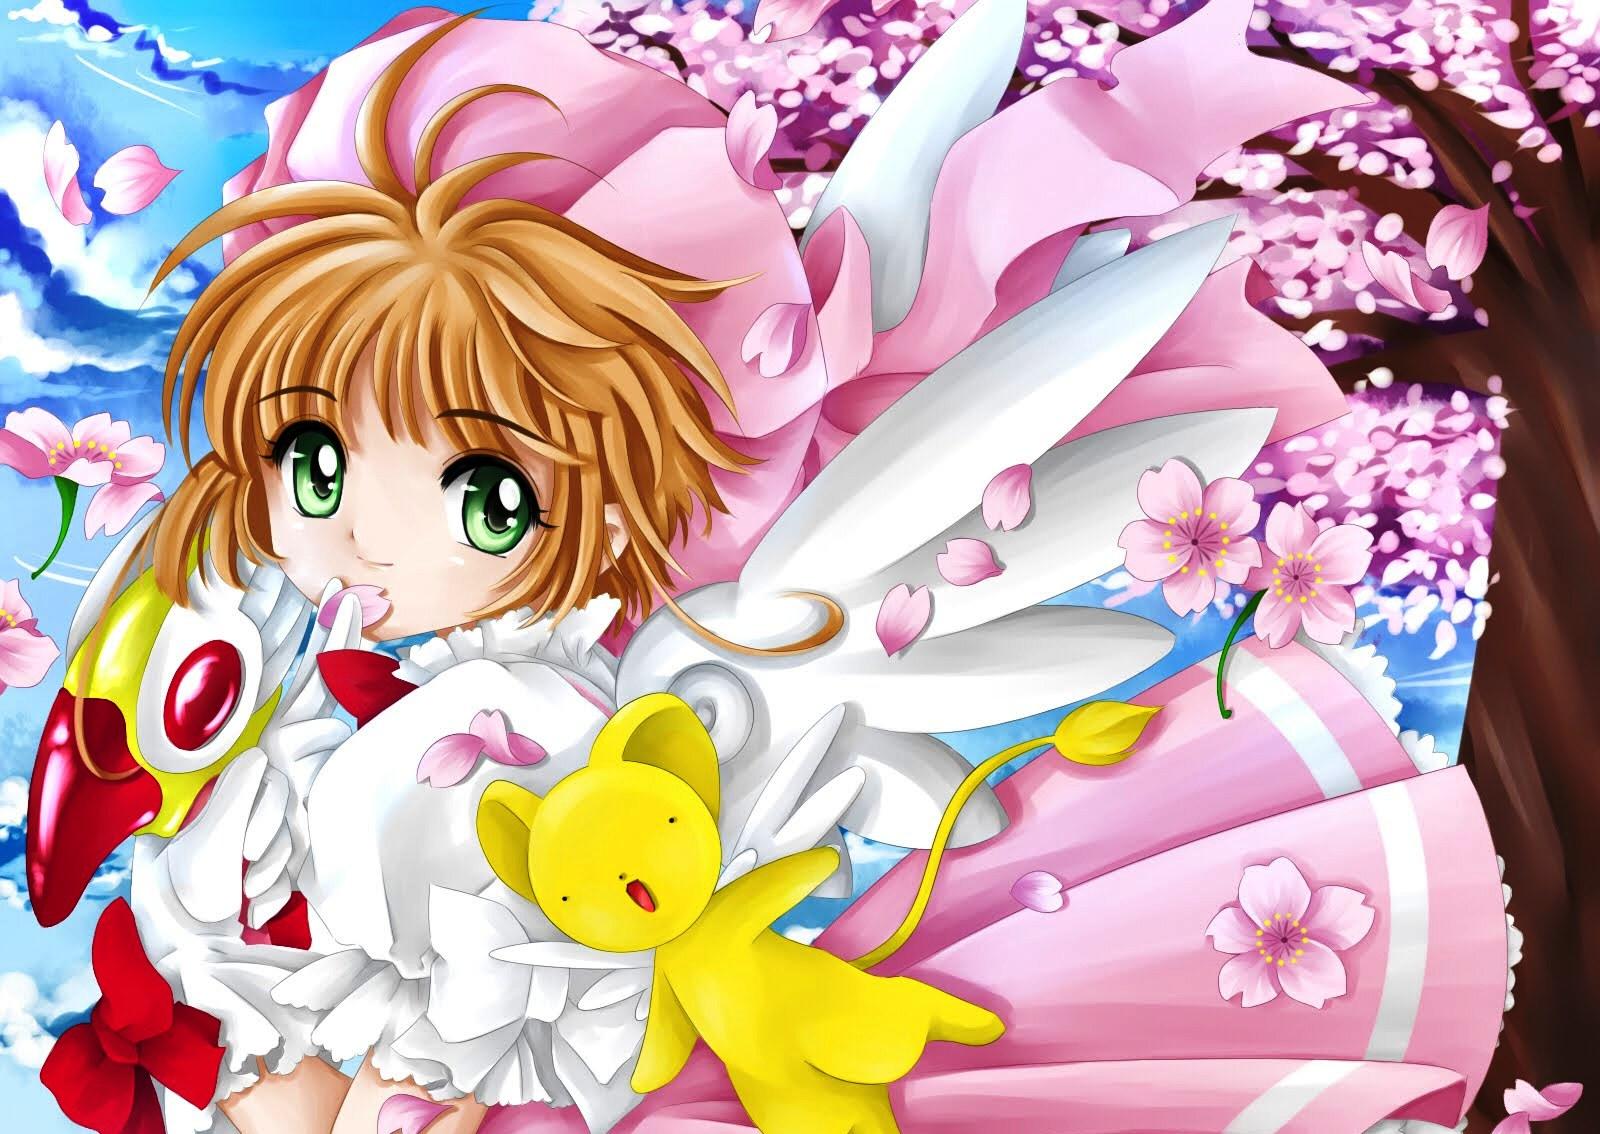 Gambar Kartun Perempuan Cantik - Serviette De Bain Sakura Card Captor - HD Wallpaper